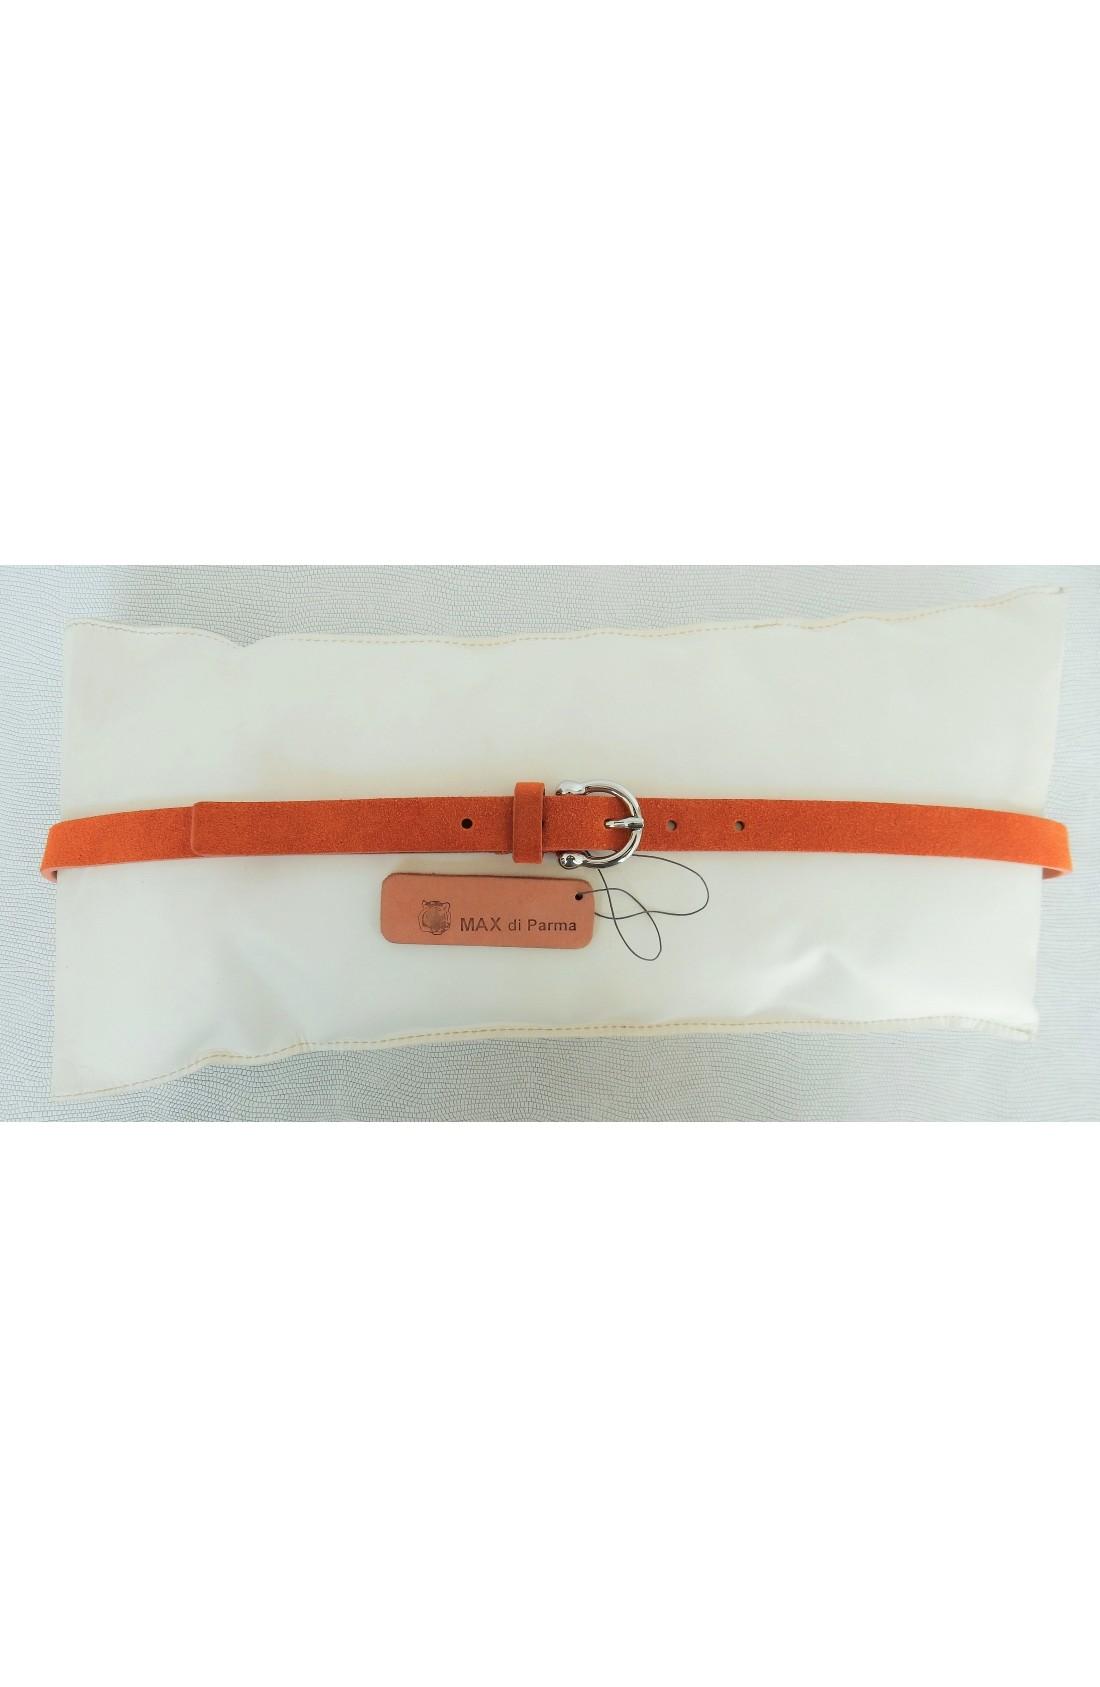 art. 601 SCAMOSCIATO mm.20 var.81 arancio mattone fibbia L 70 mm.20 nikel free (5)